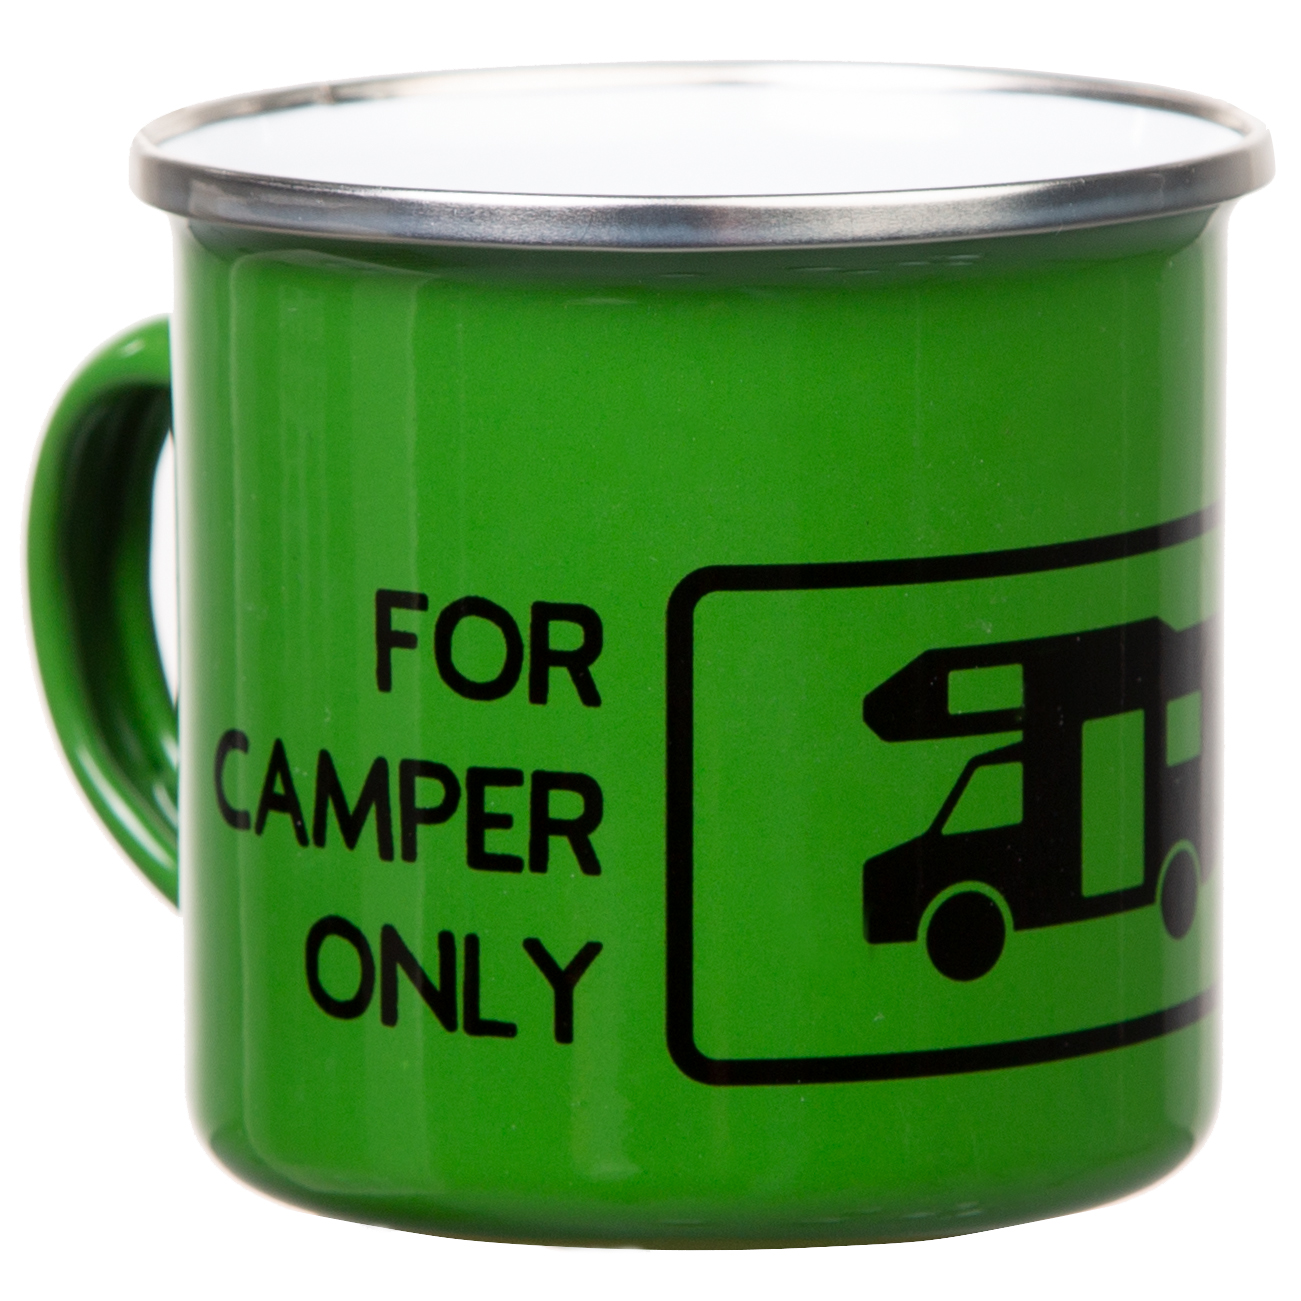 FOR CAMPER ONLY